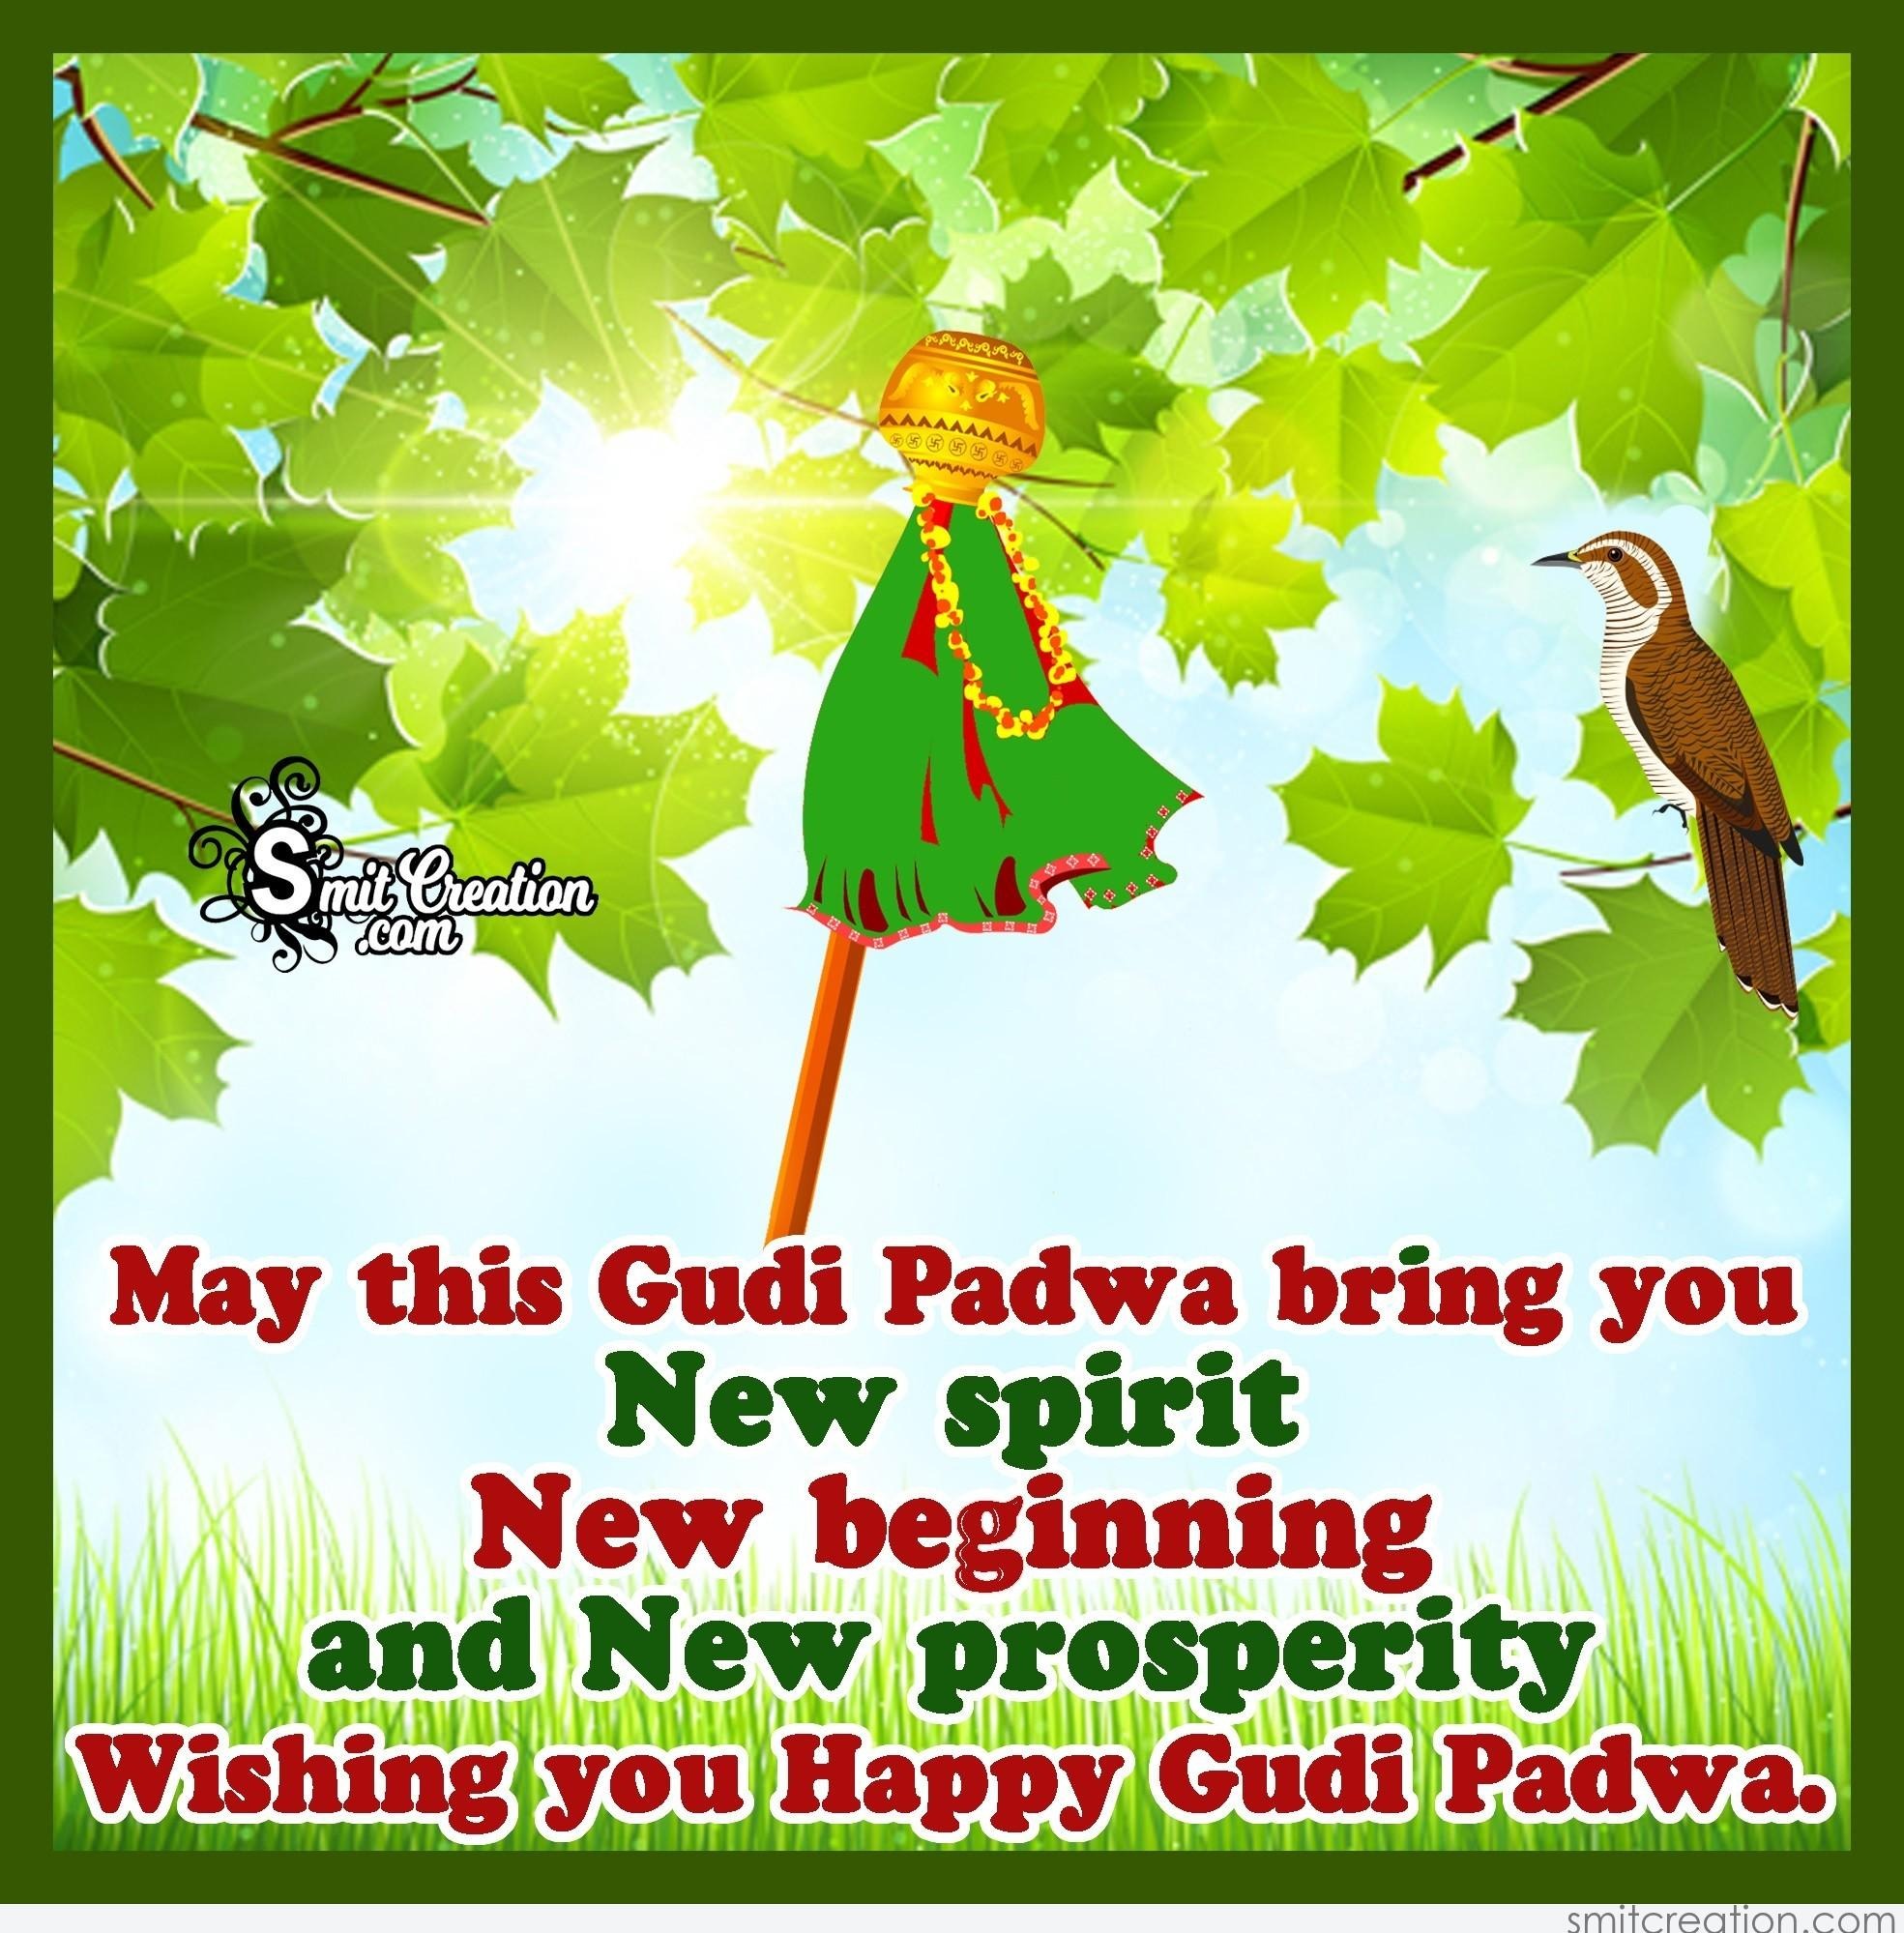 Wishing You Happy Gudi Padwa Smitcreation